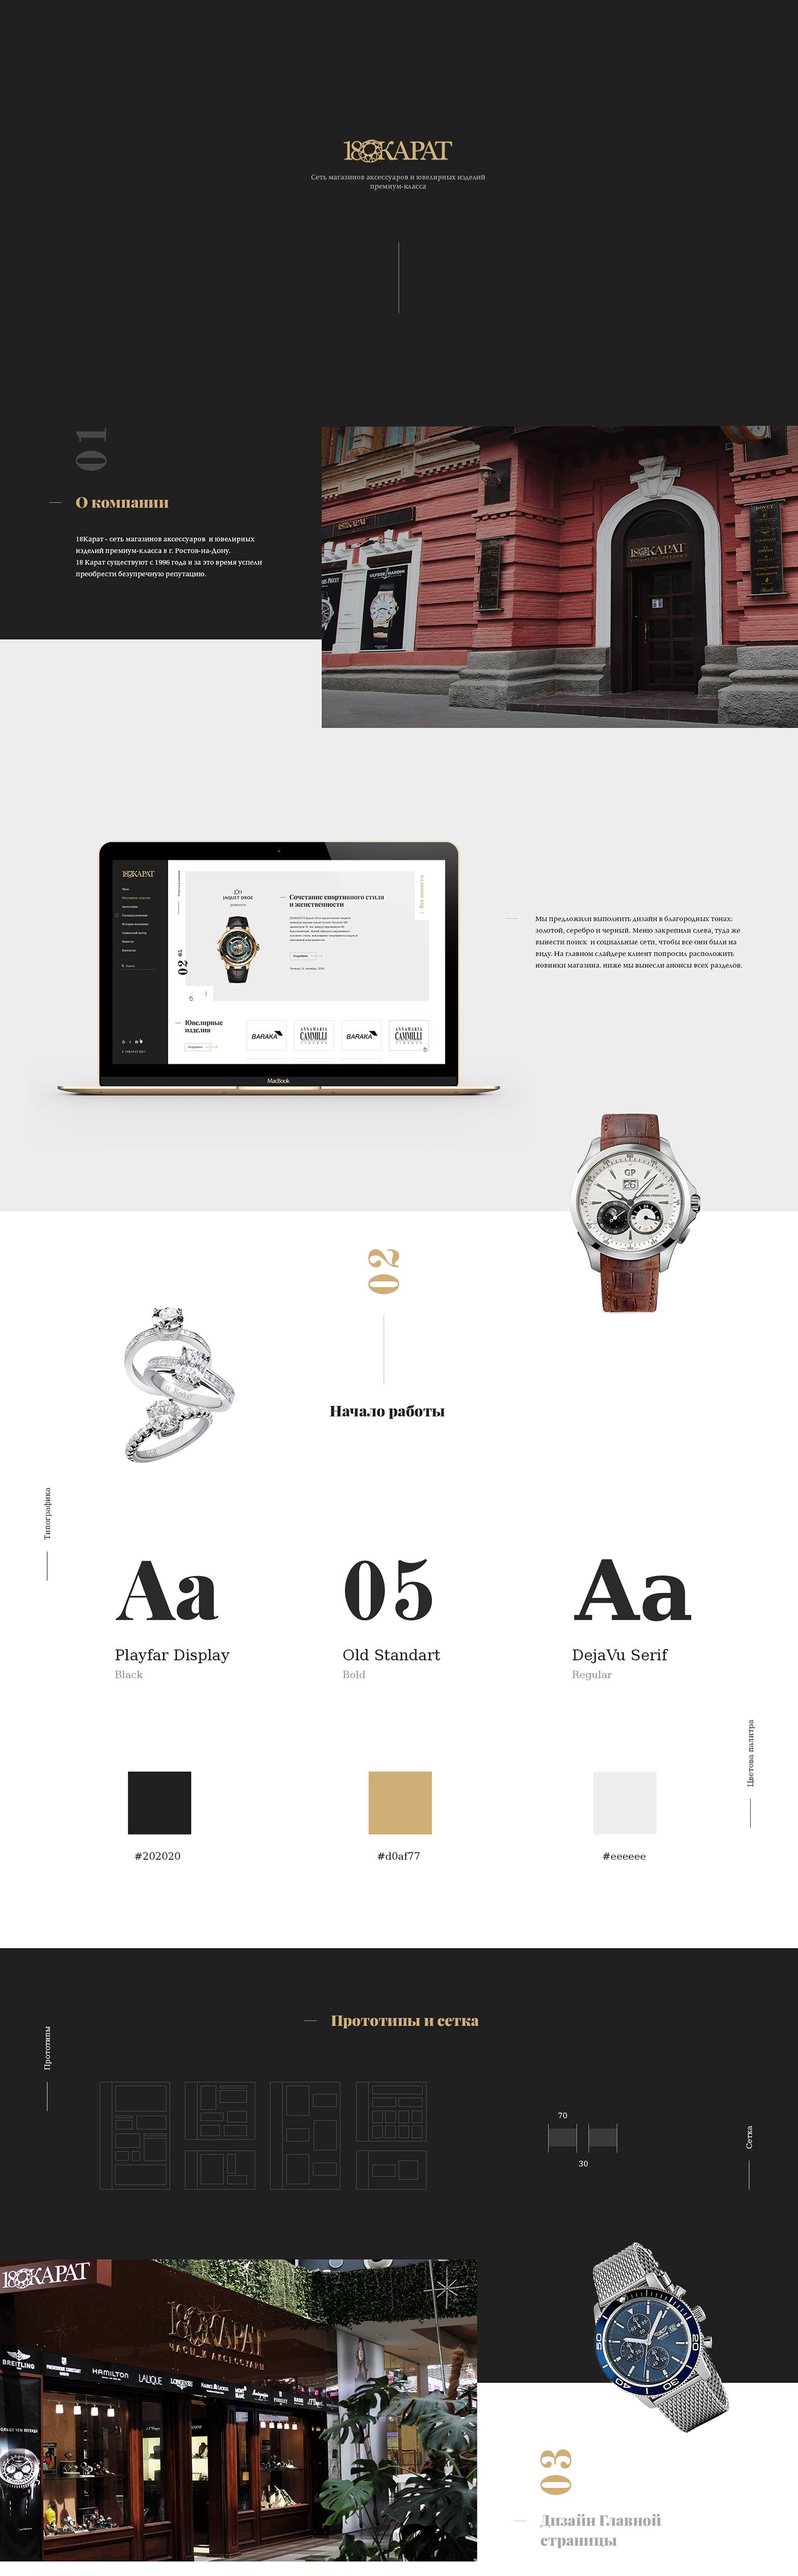 Boutique Watches Shops Webdevelopment ux/ui Ecommerce dark gold Classic Fashion  design